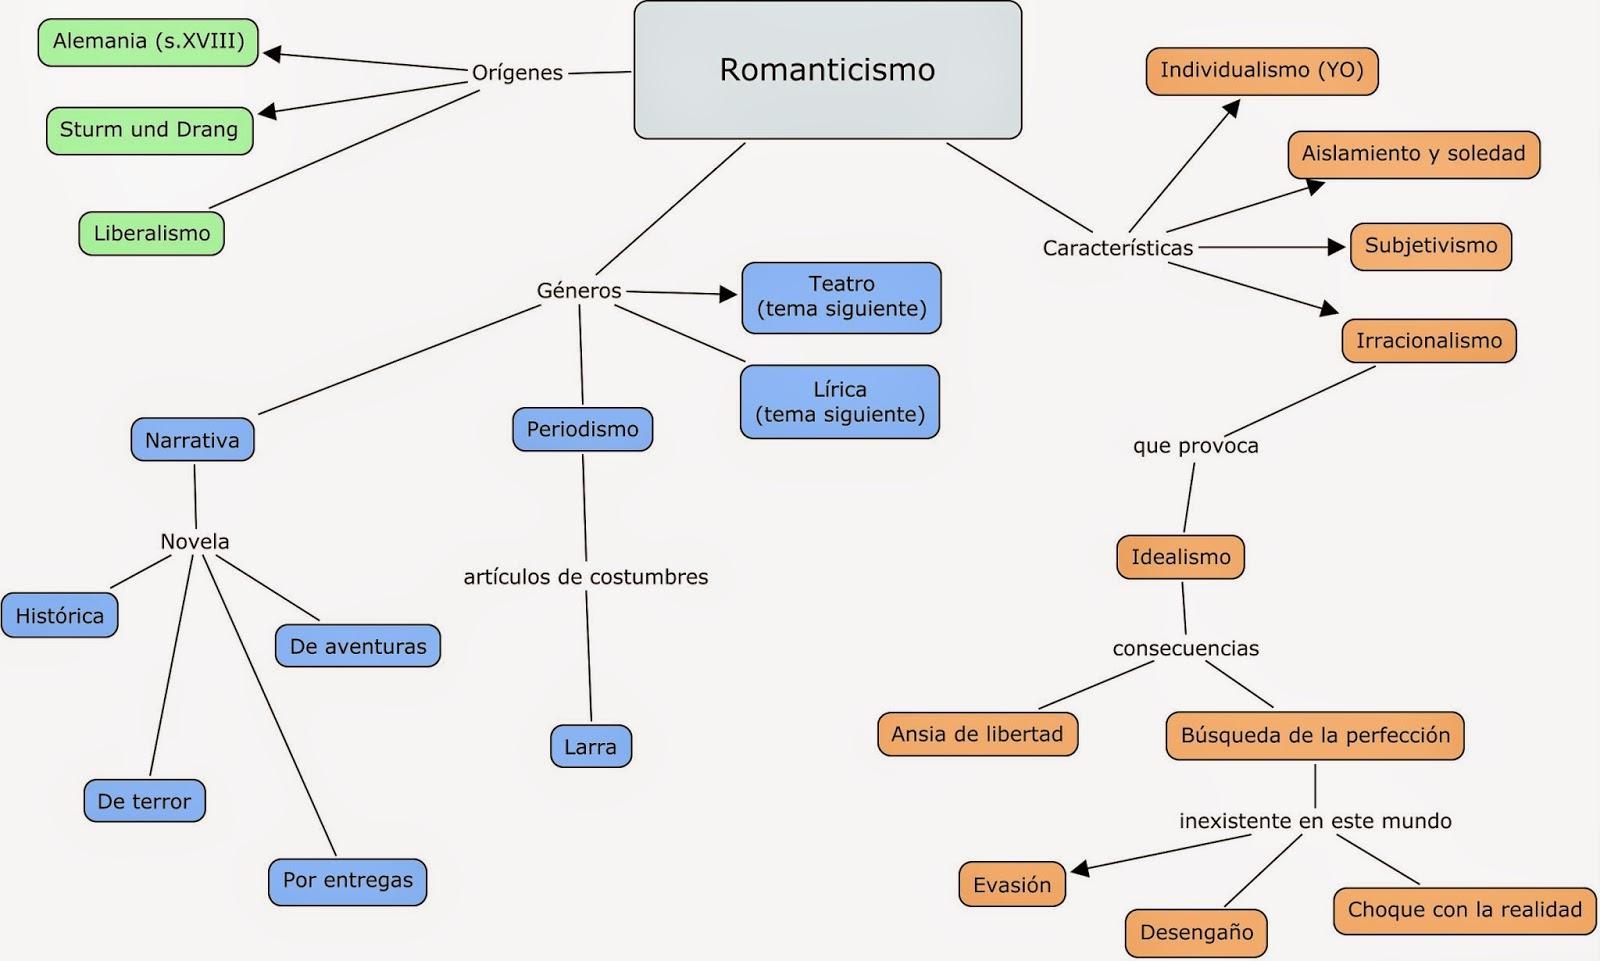 Movimiento Literario Image Mag : romanticismo1 from imagemag.ru size 1600 x 961 jpeg 153kB